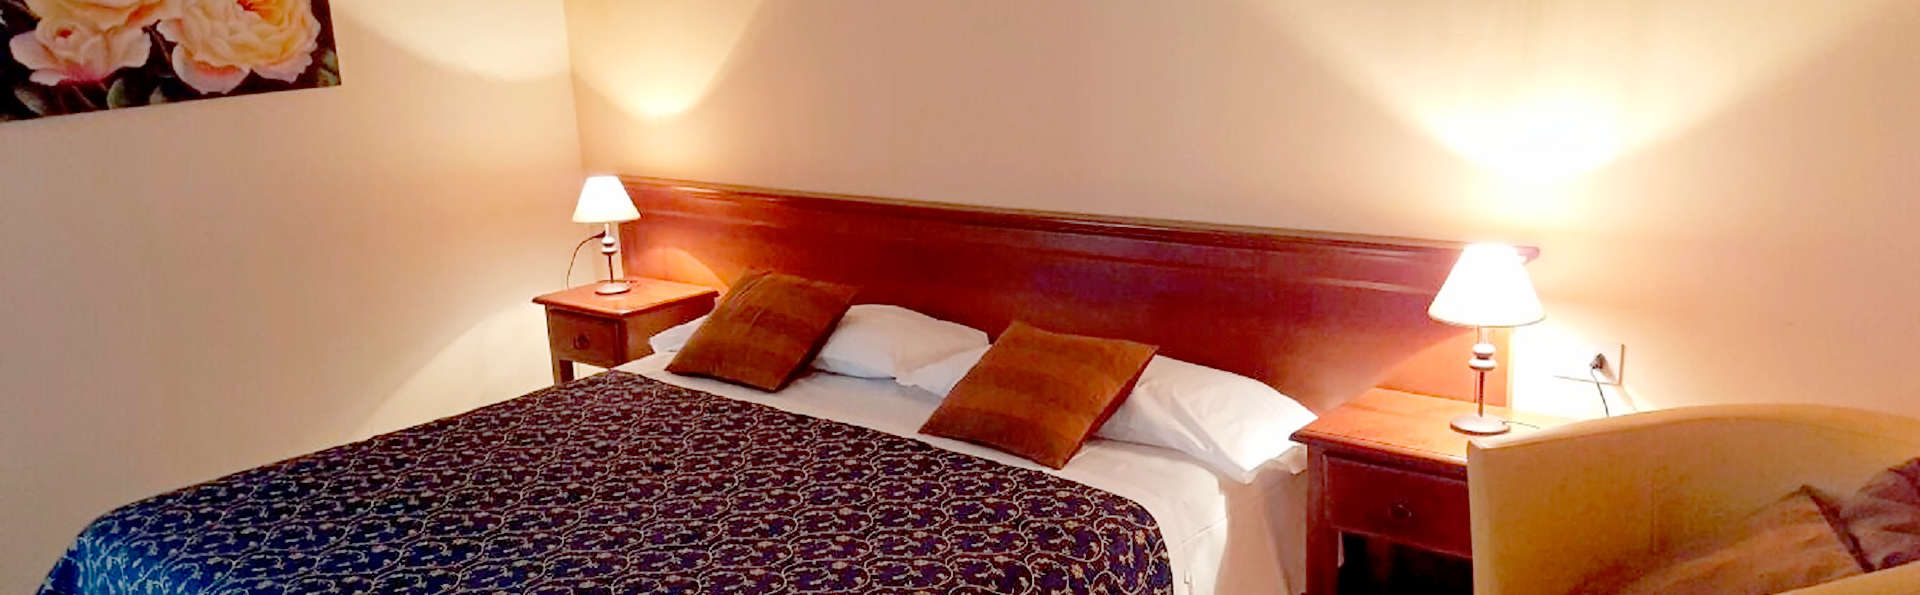 Hotel Borgo Antico - Edit_Room4.jpg